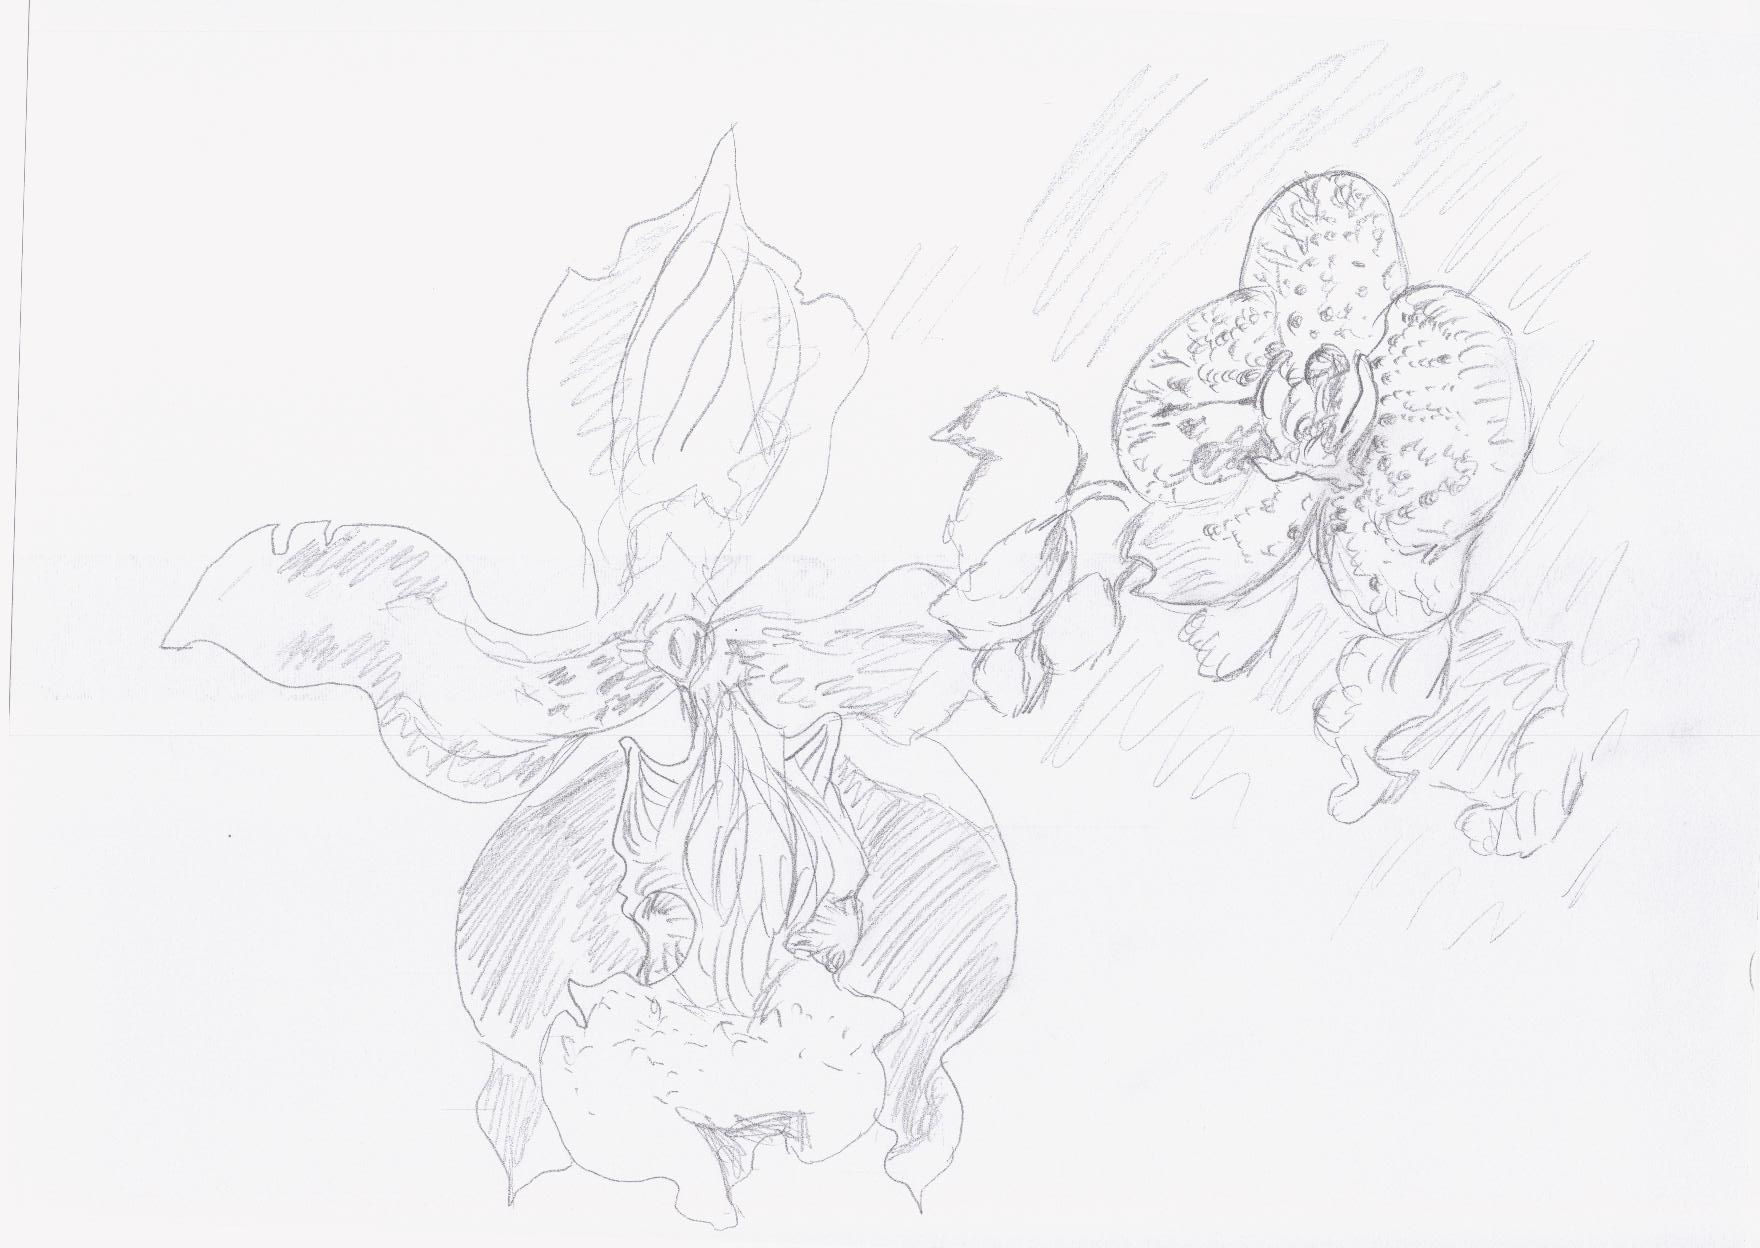 Orchidee, Skizze (2013, 21 x 29,7 cm, A4)